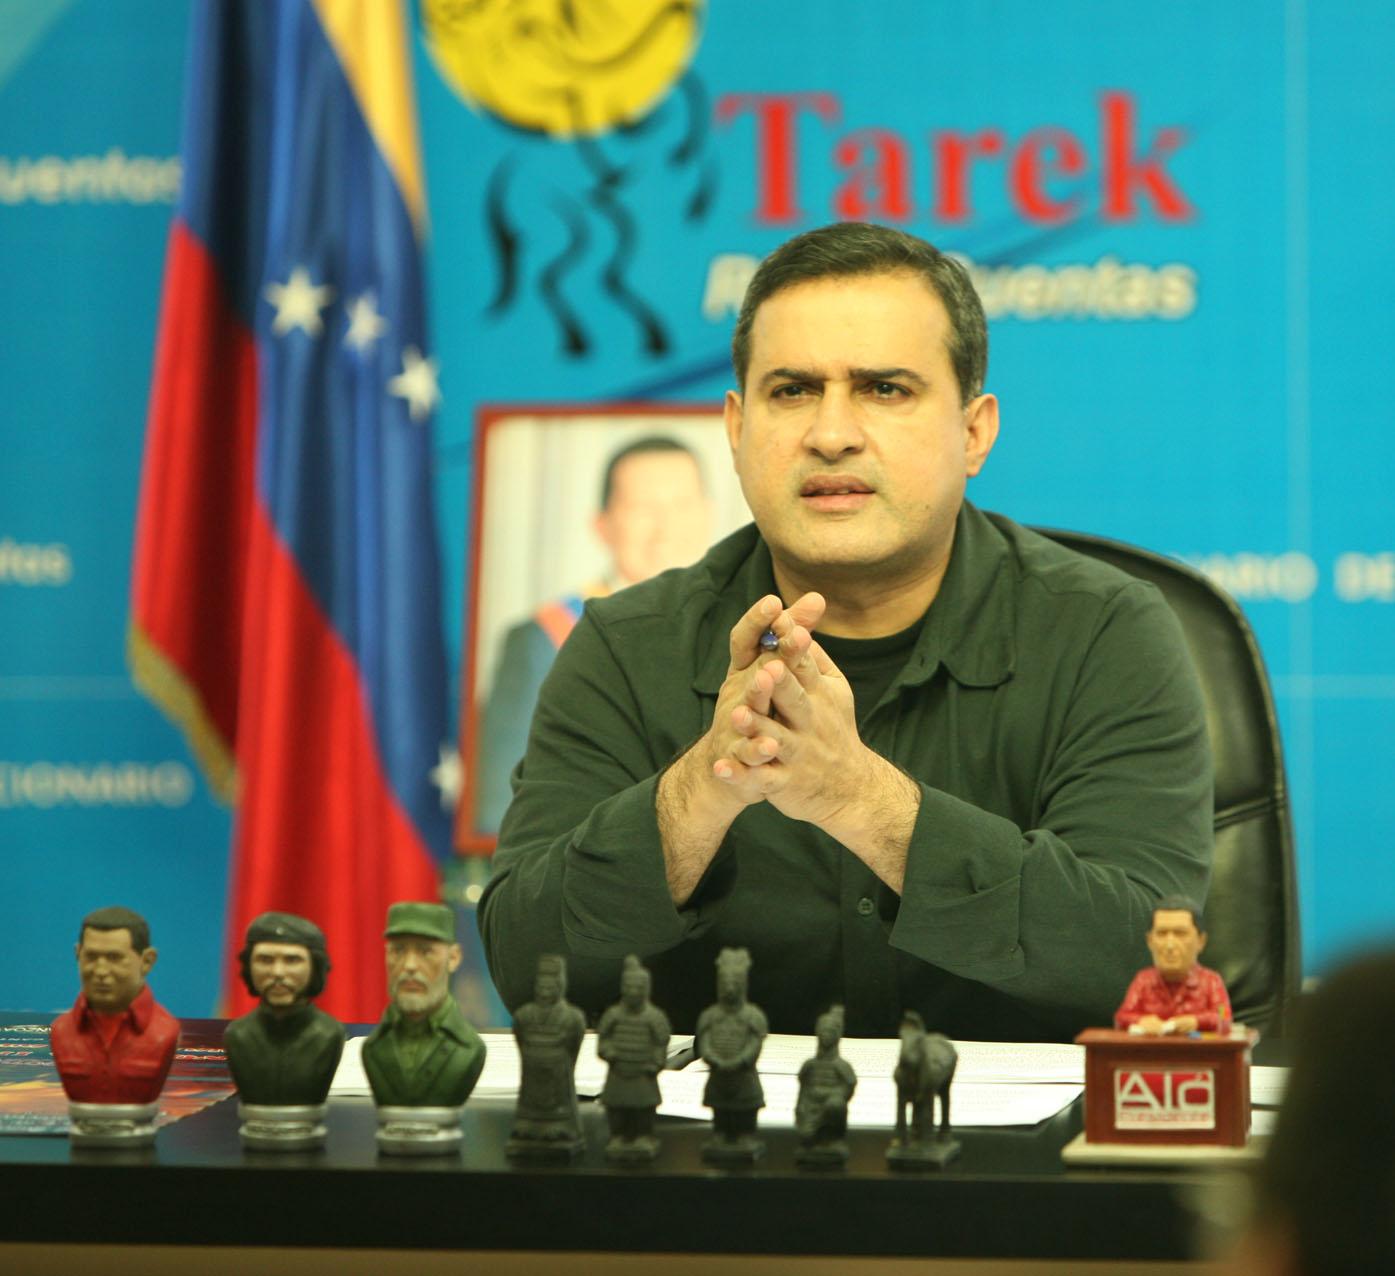 Tarek Rinde Cuentas Nº 210